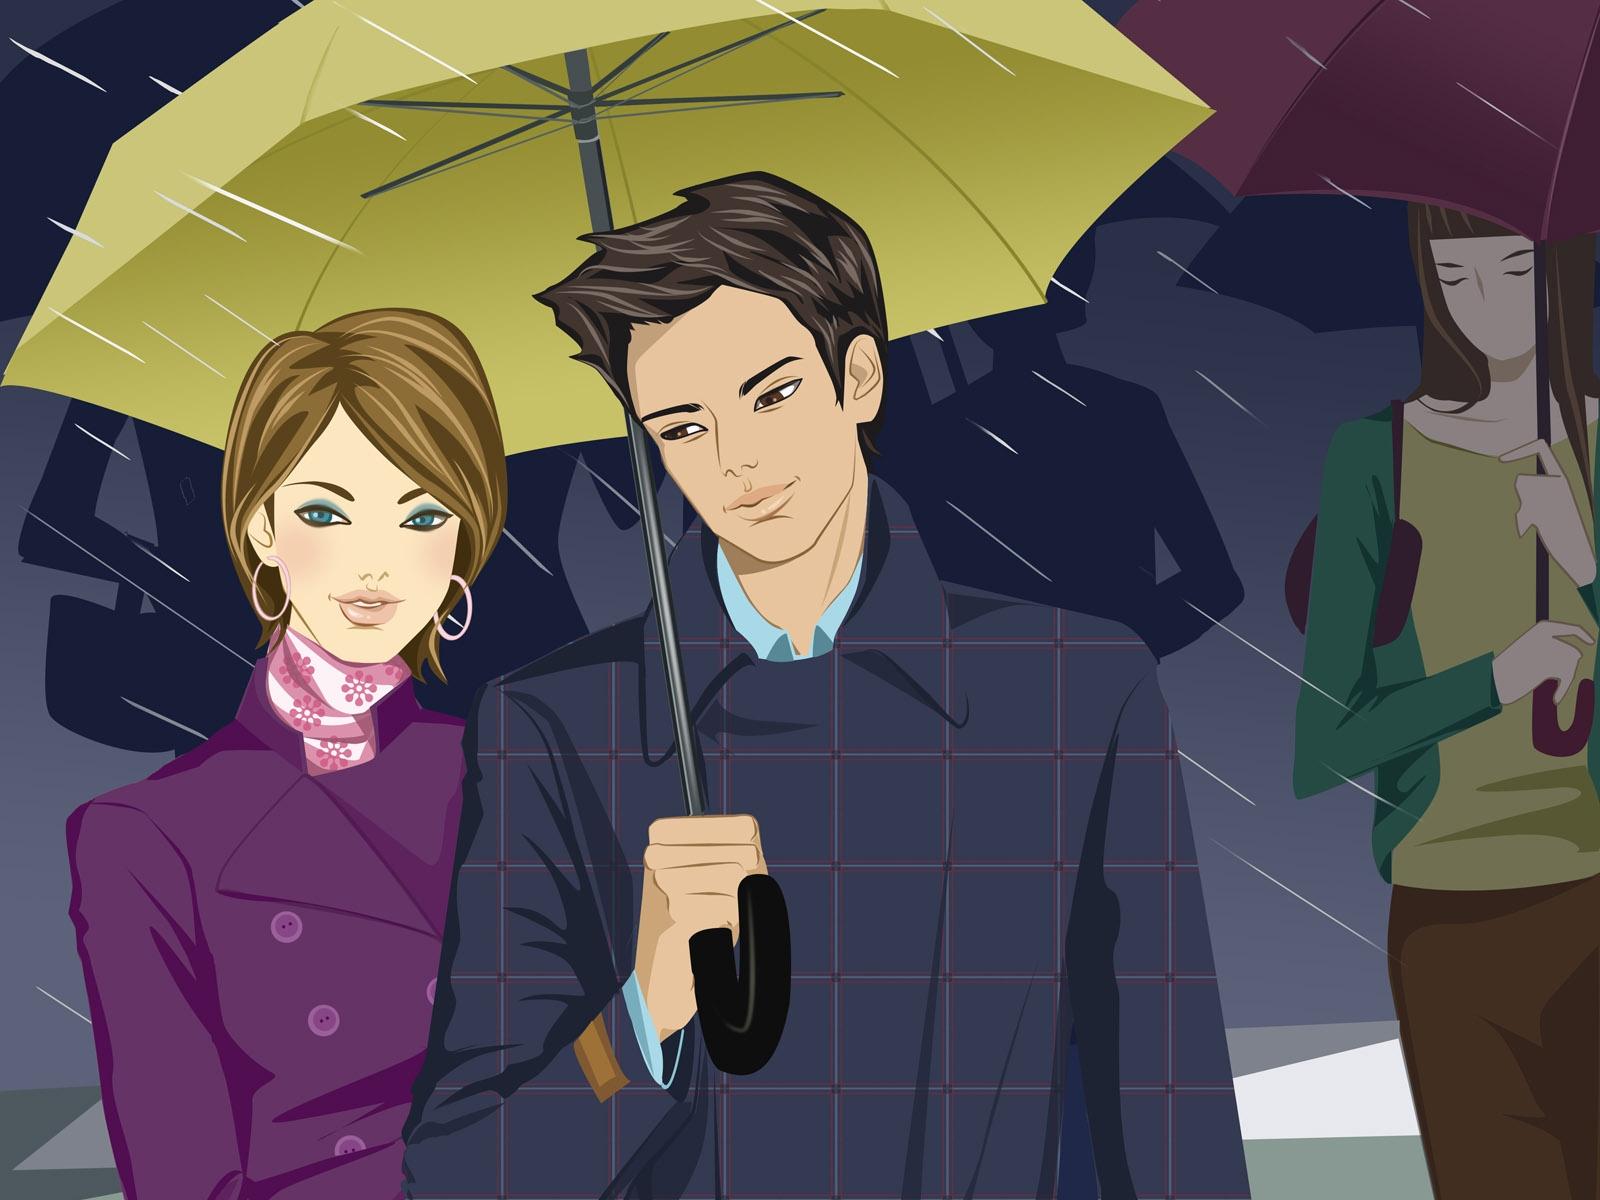 Wallpaper Illustration Anime Love Rain Umbrella Cartoon